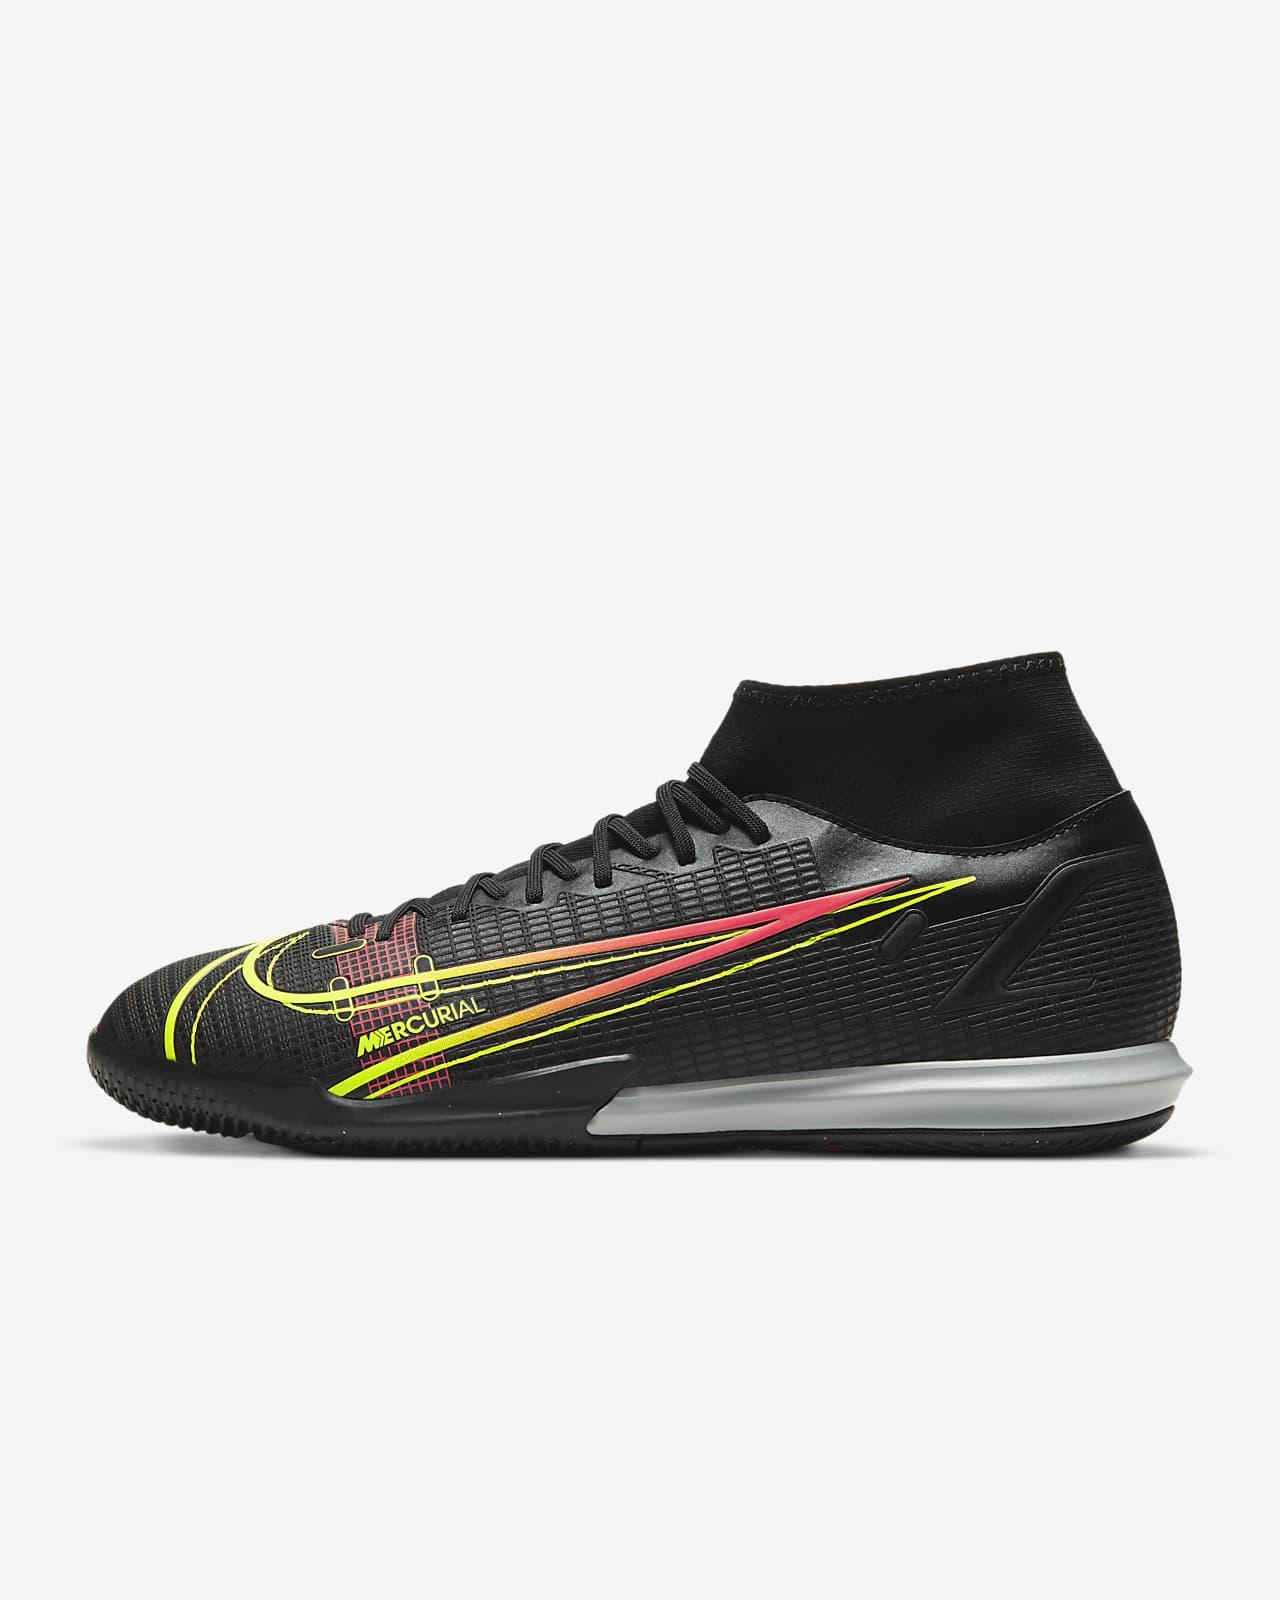 Calzado de fútbol para cancha cubierta Nike Mercurial Superfly 8 Academy IC